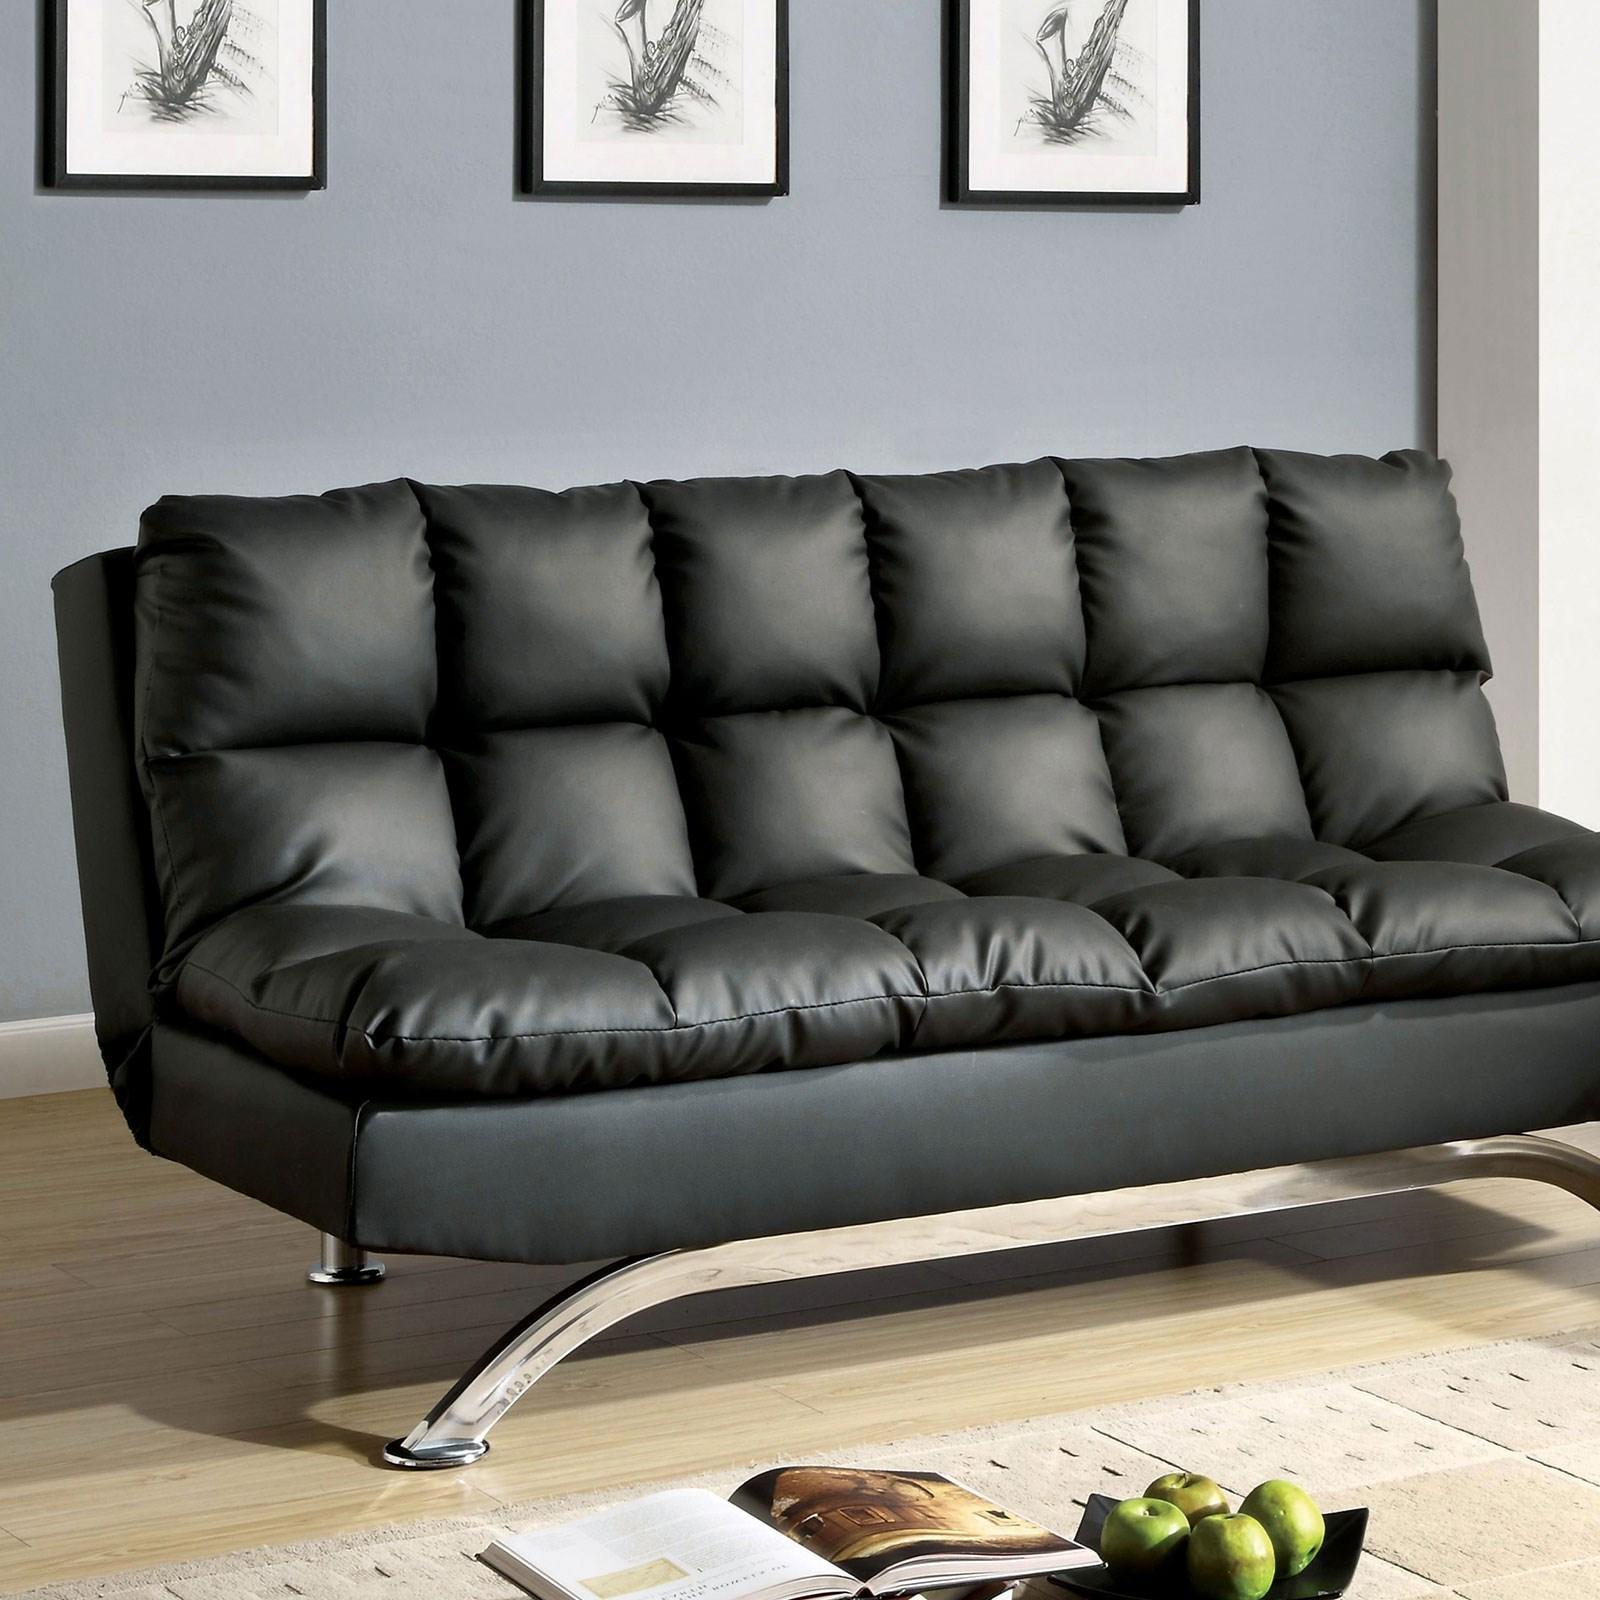 Aristo Leatherette Futon Sofa at Household Furniture